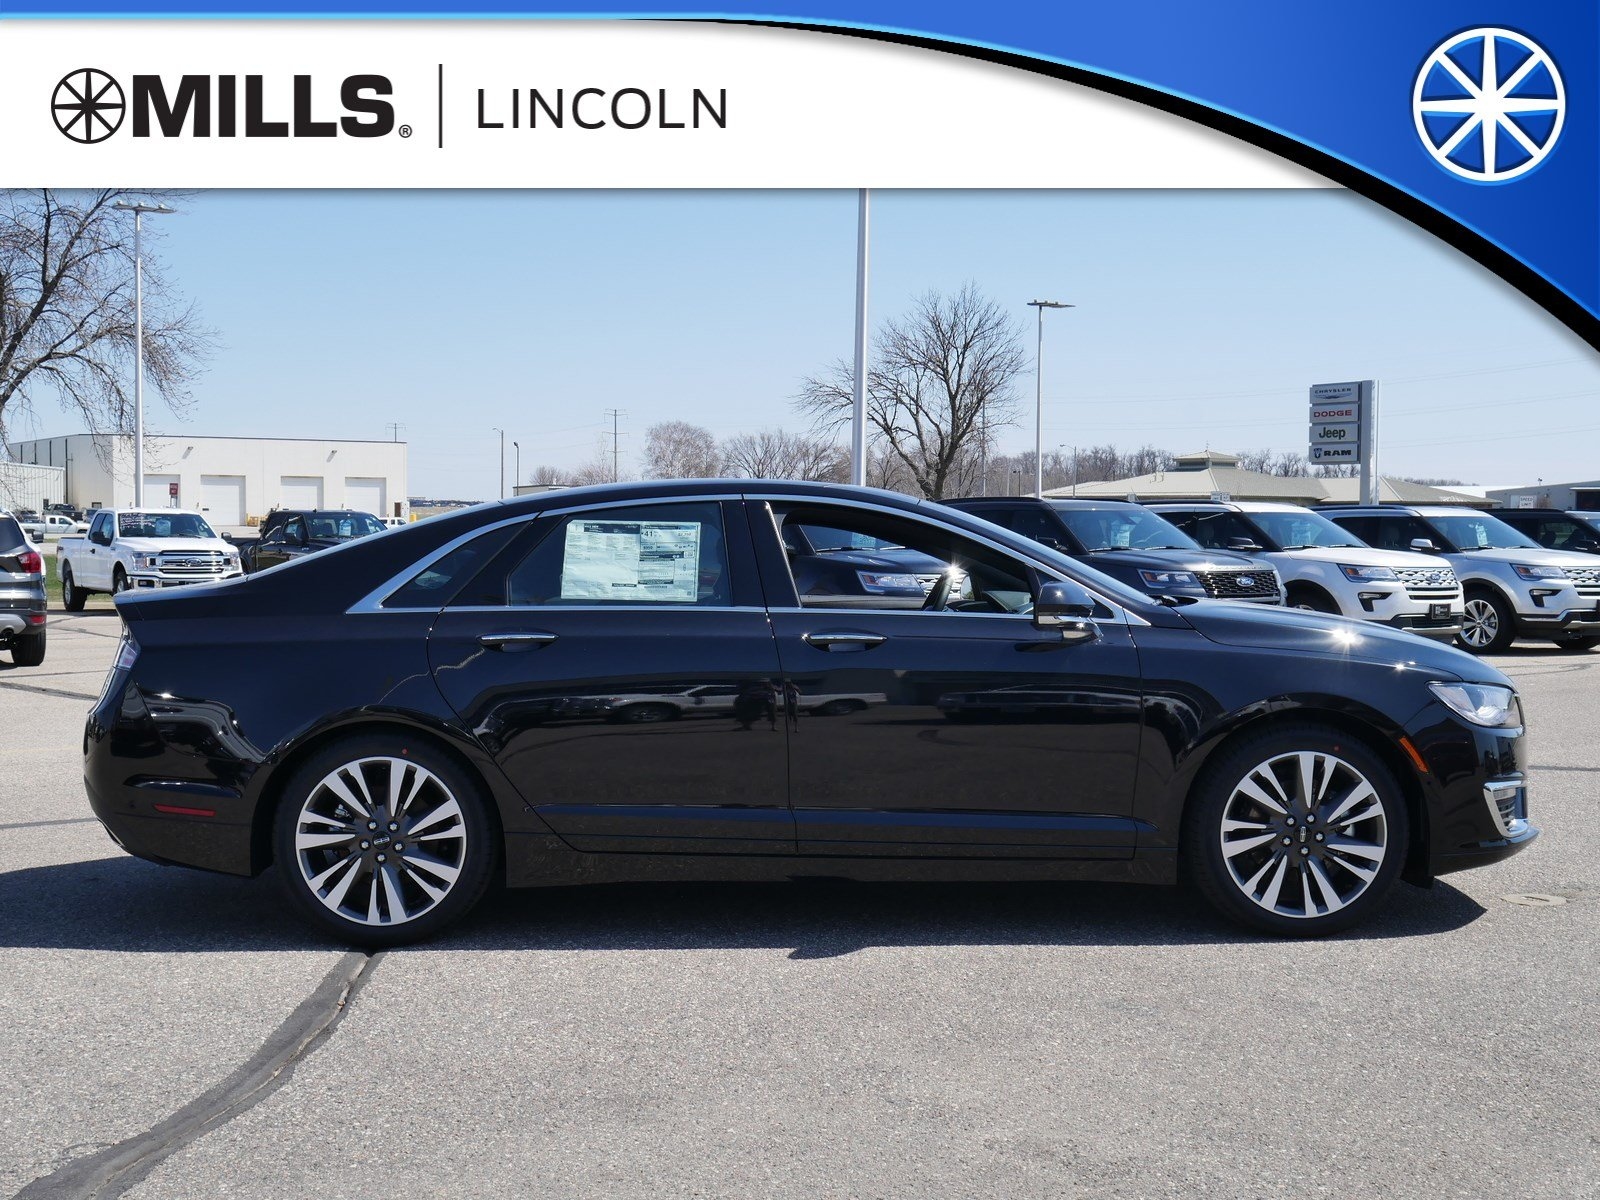 2019 Lincoln MKZ Hybrid Sedan